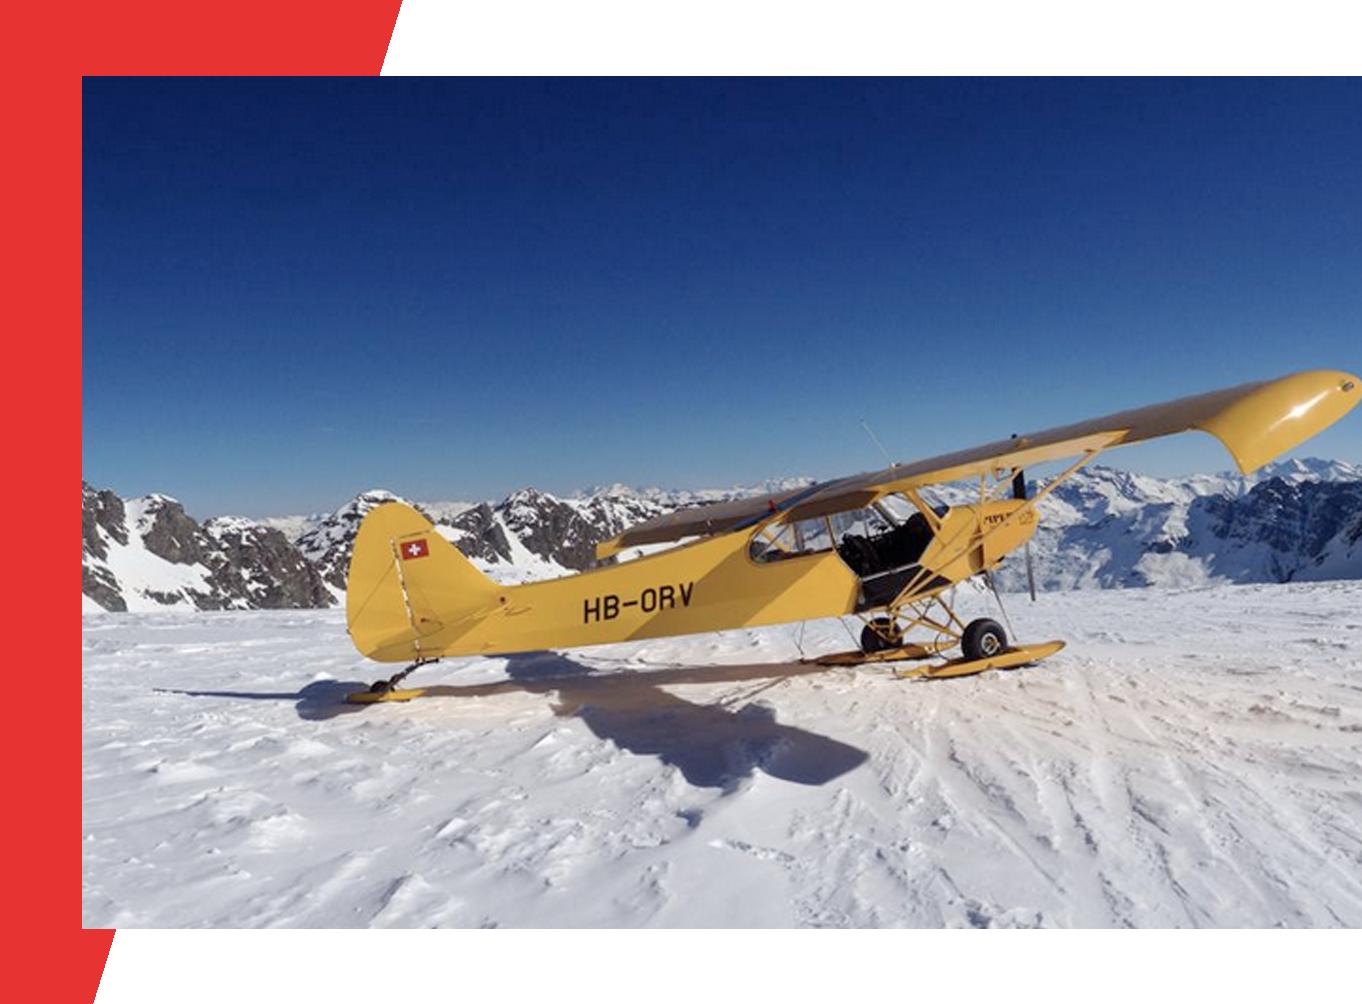 https://www.lausanne-aeroclub.ch/wp-content/uploads/2019/10/plane_SuperCub.png